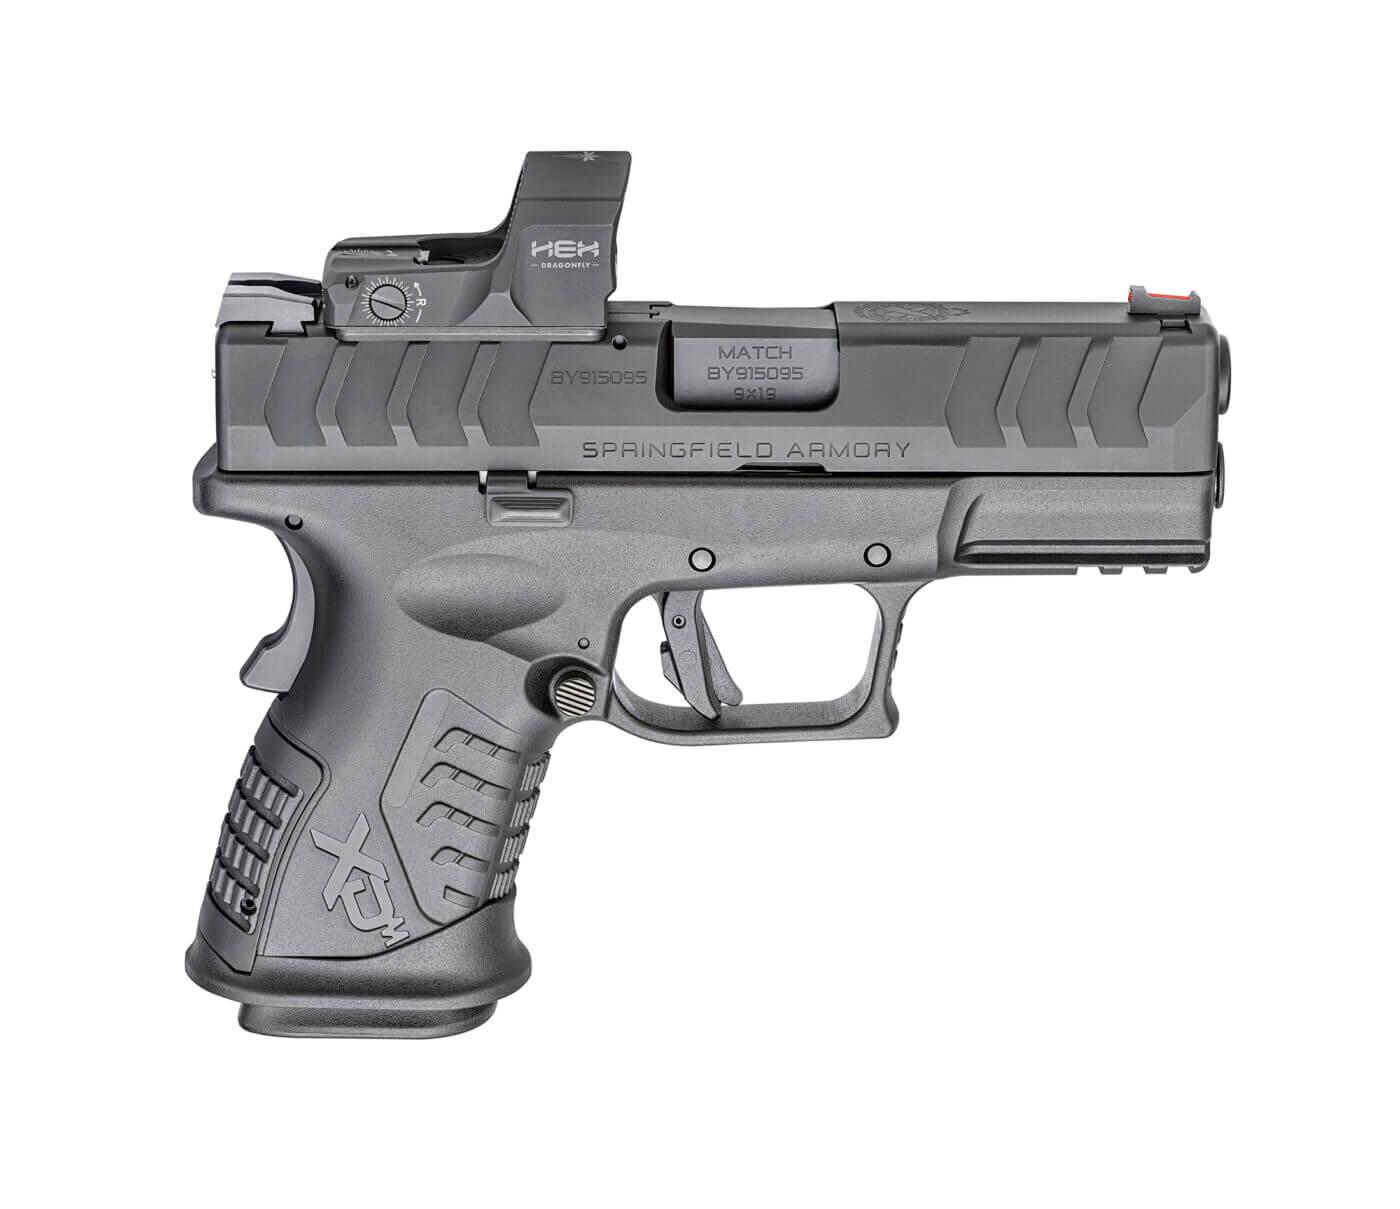 Springfield XD-M Elite 3.8″ Compact OSP pistol